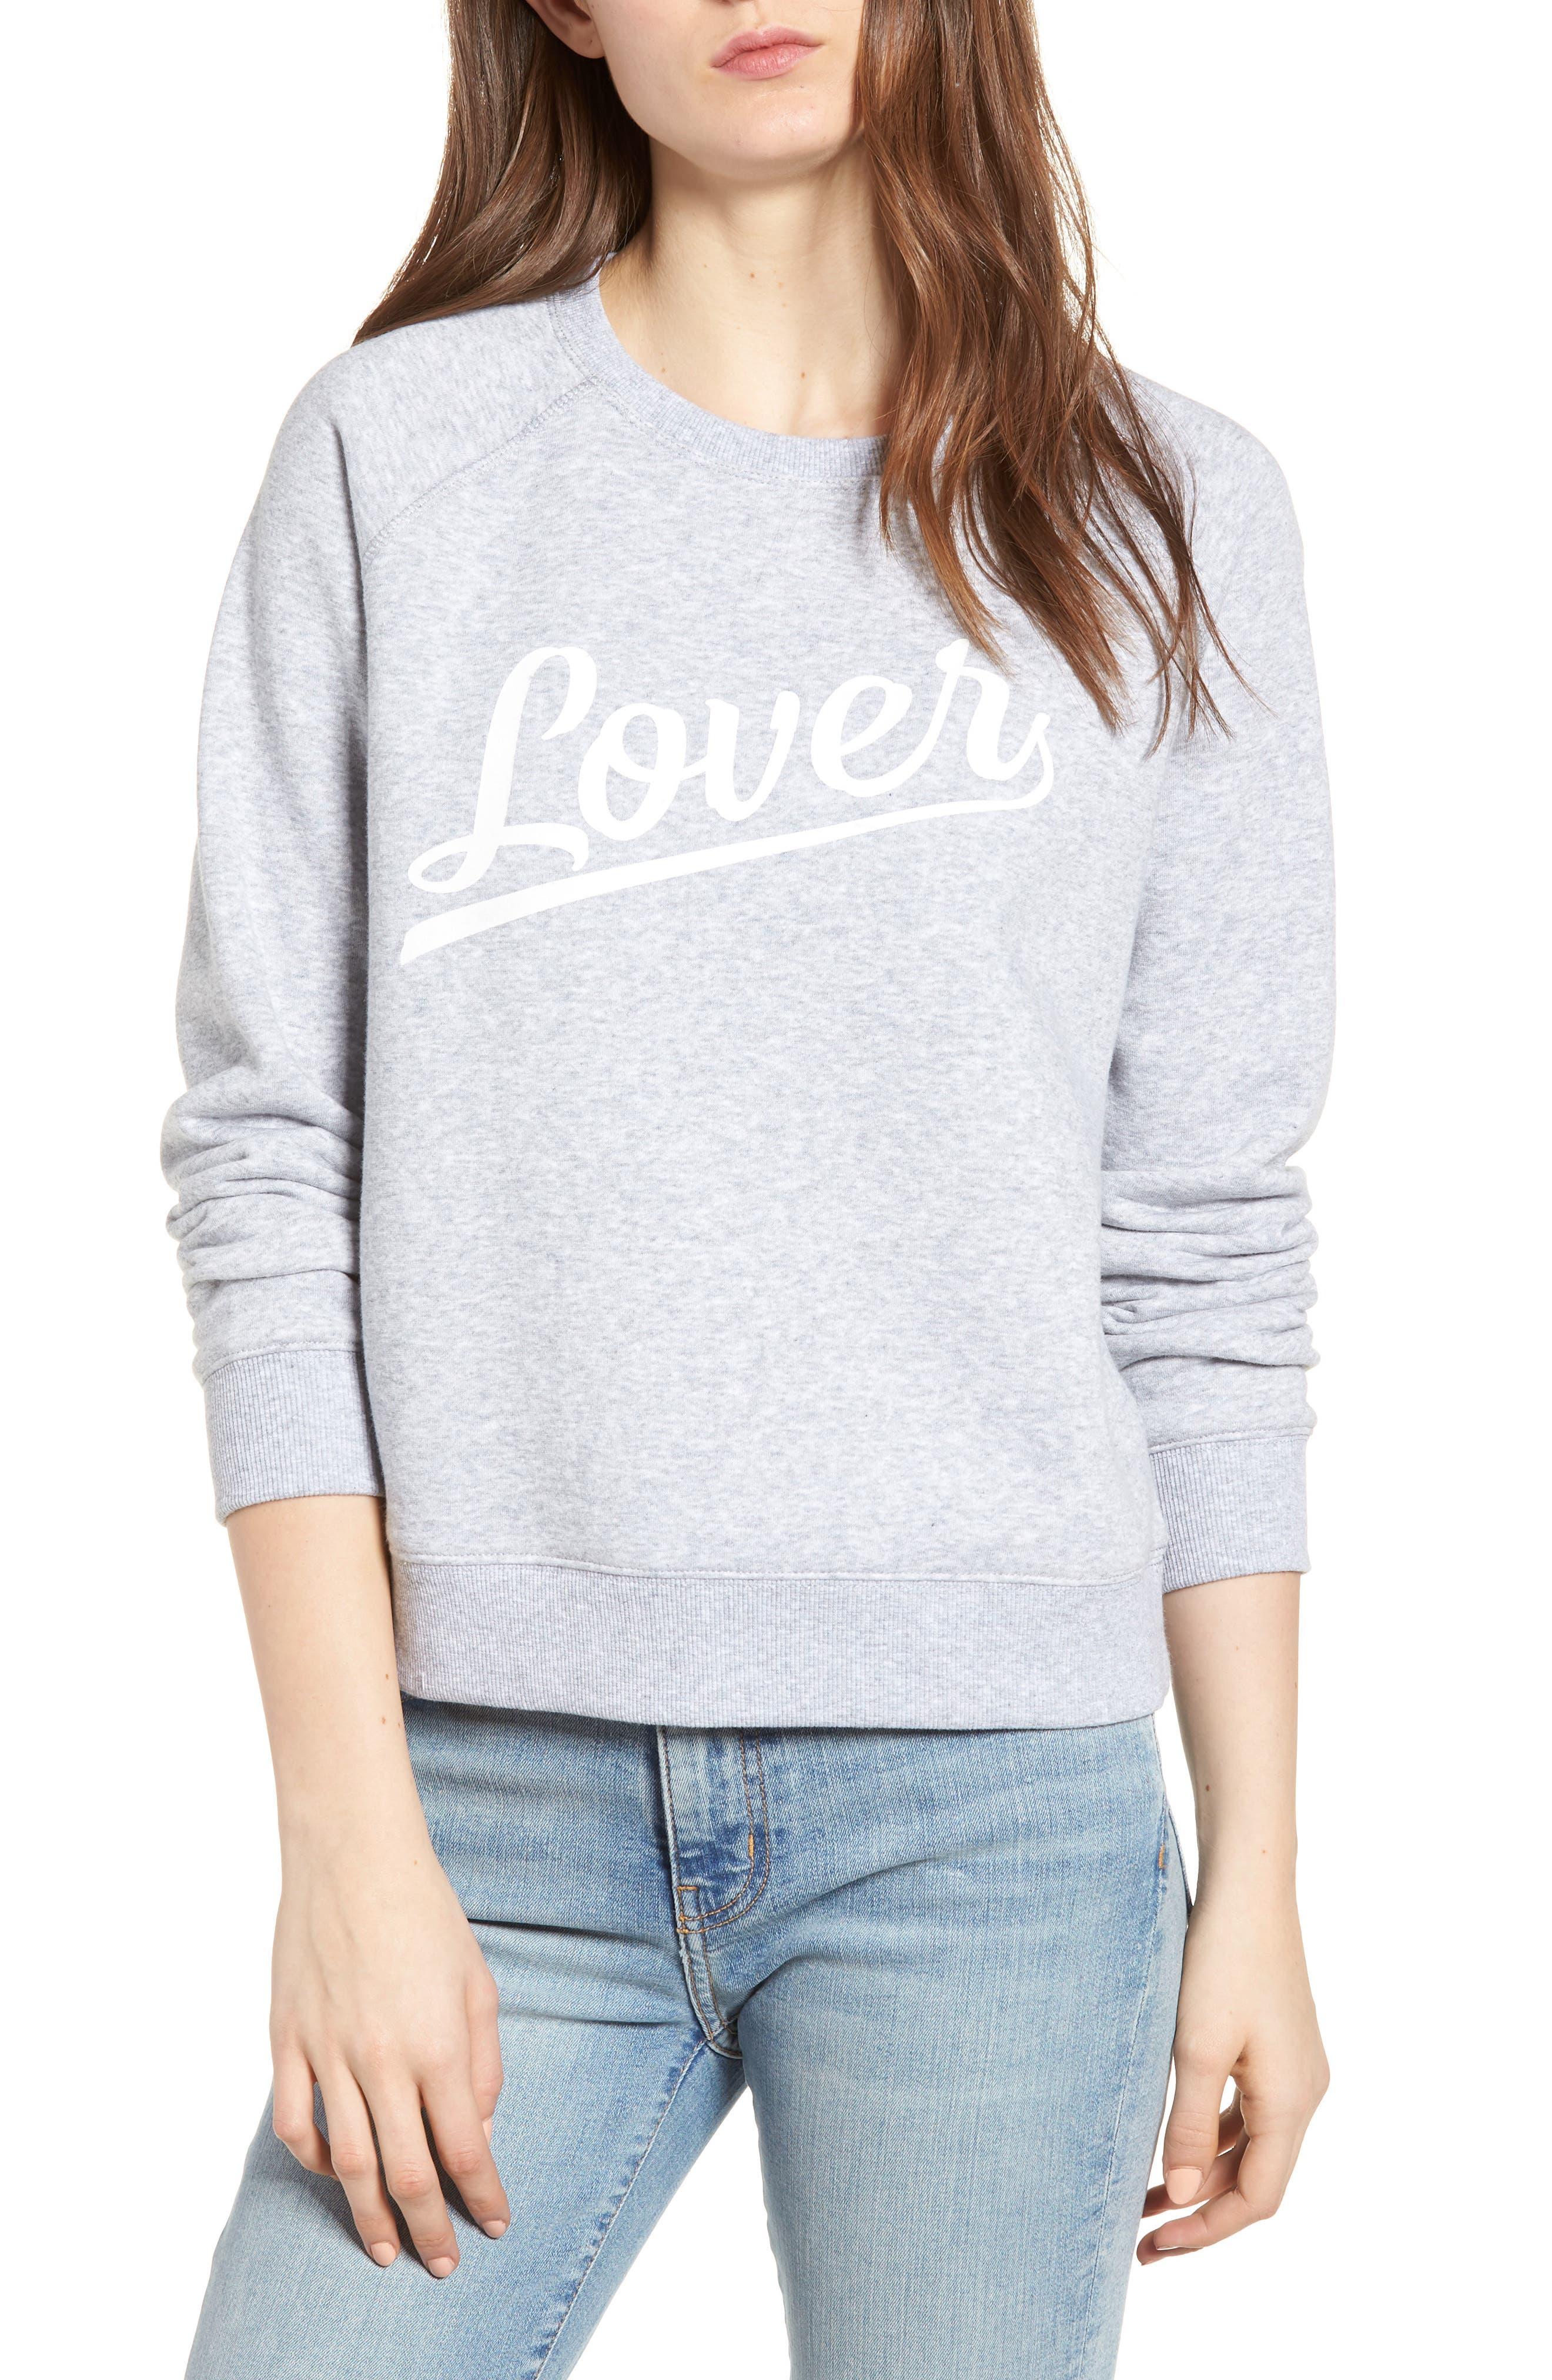 Lover Sweatshirt,                             Main thumbnail 1, color,                             038